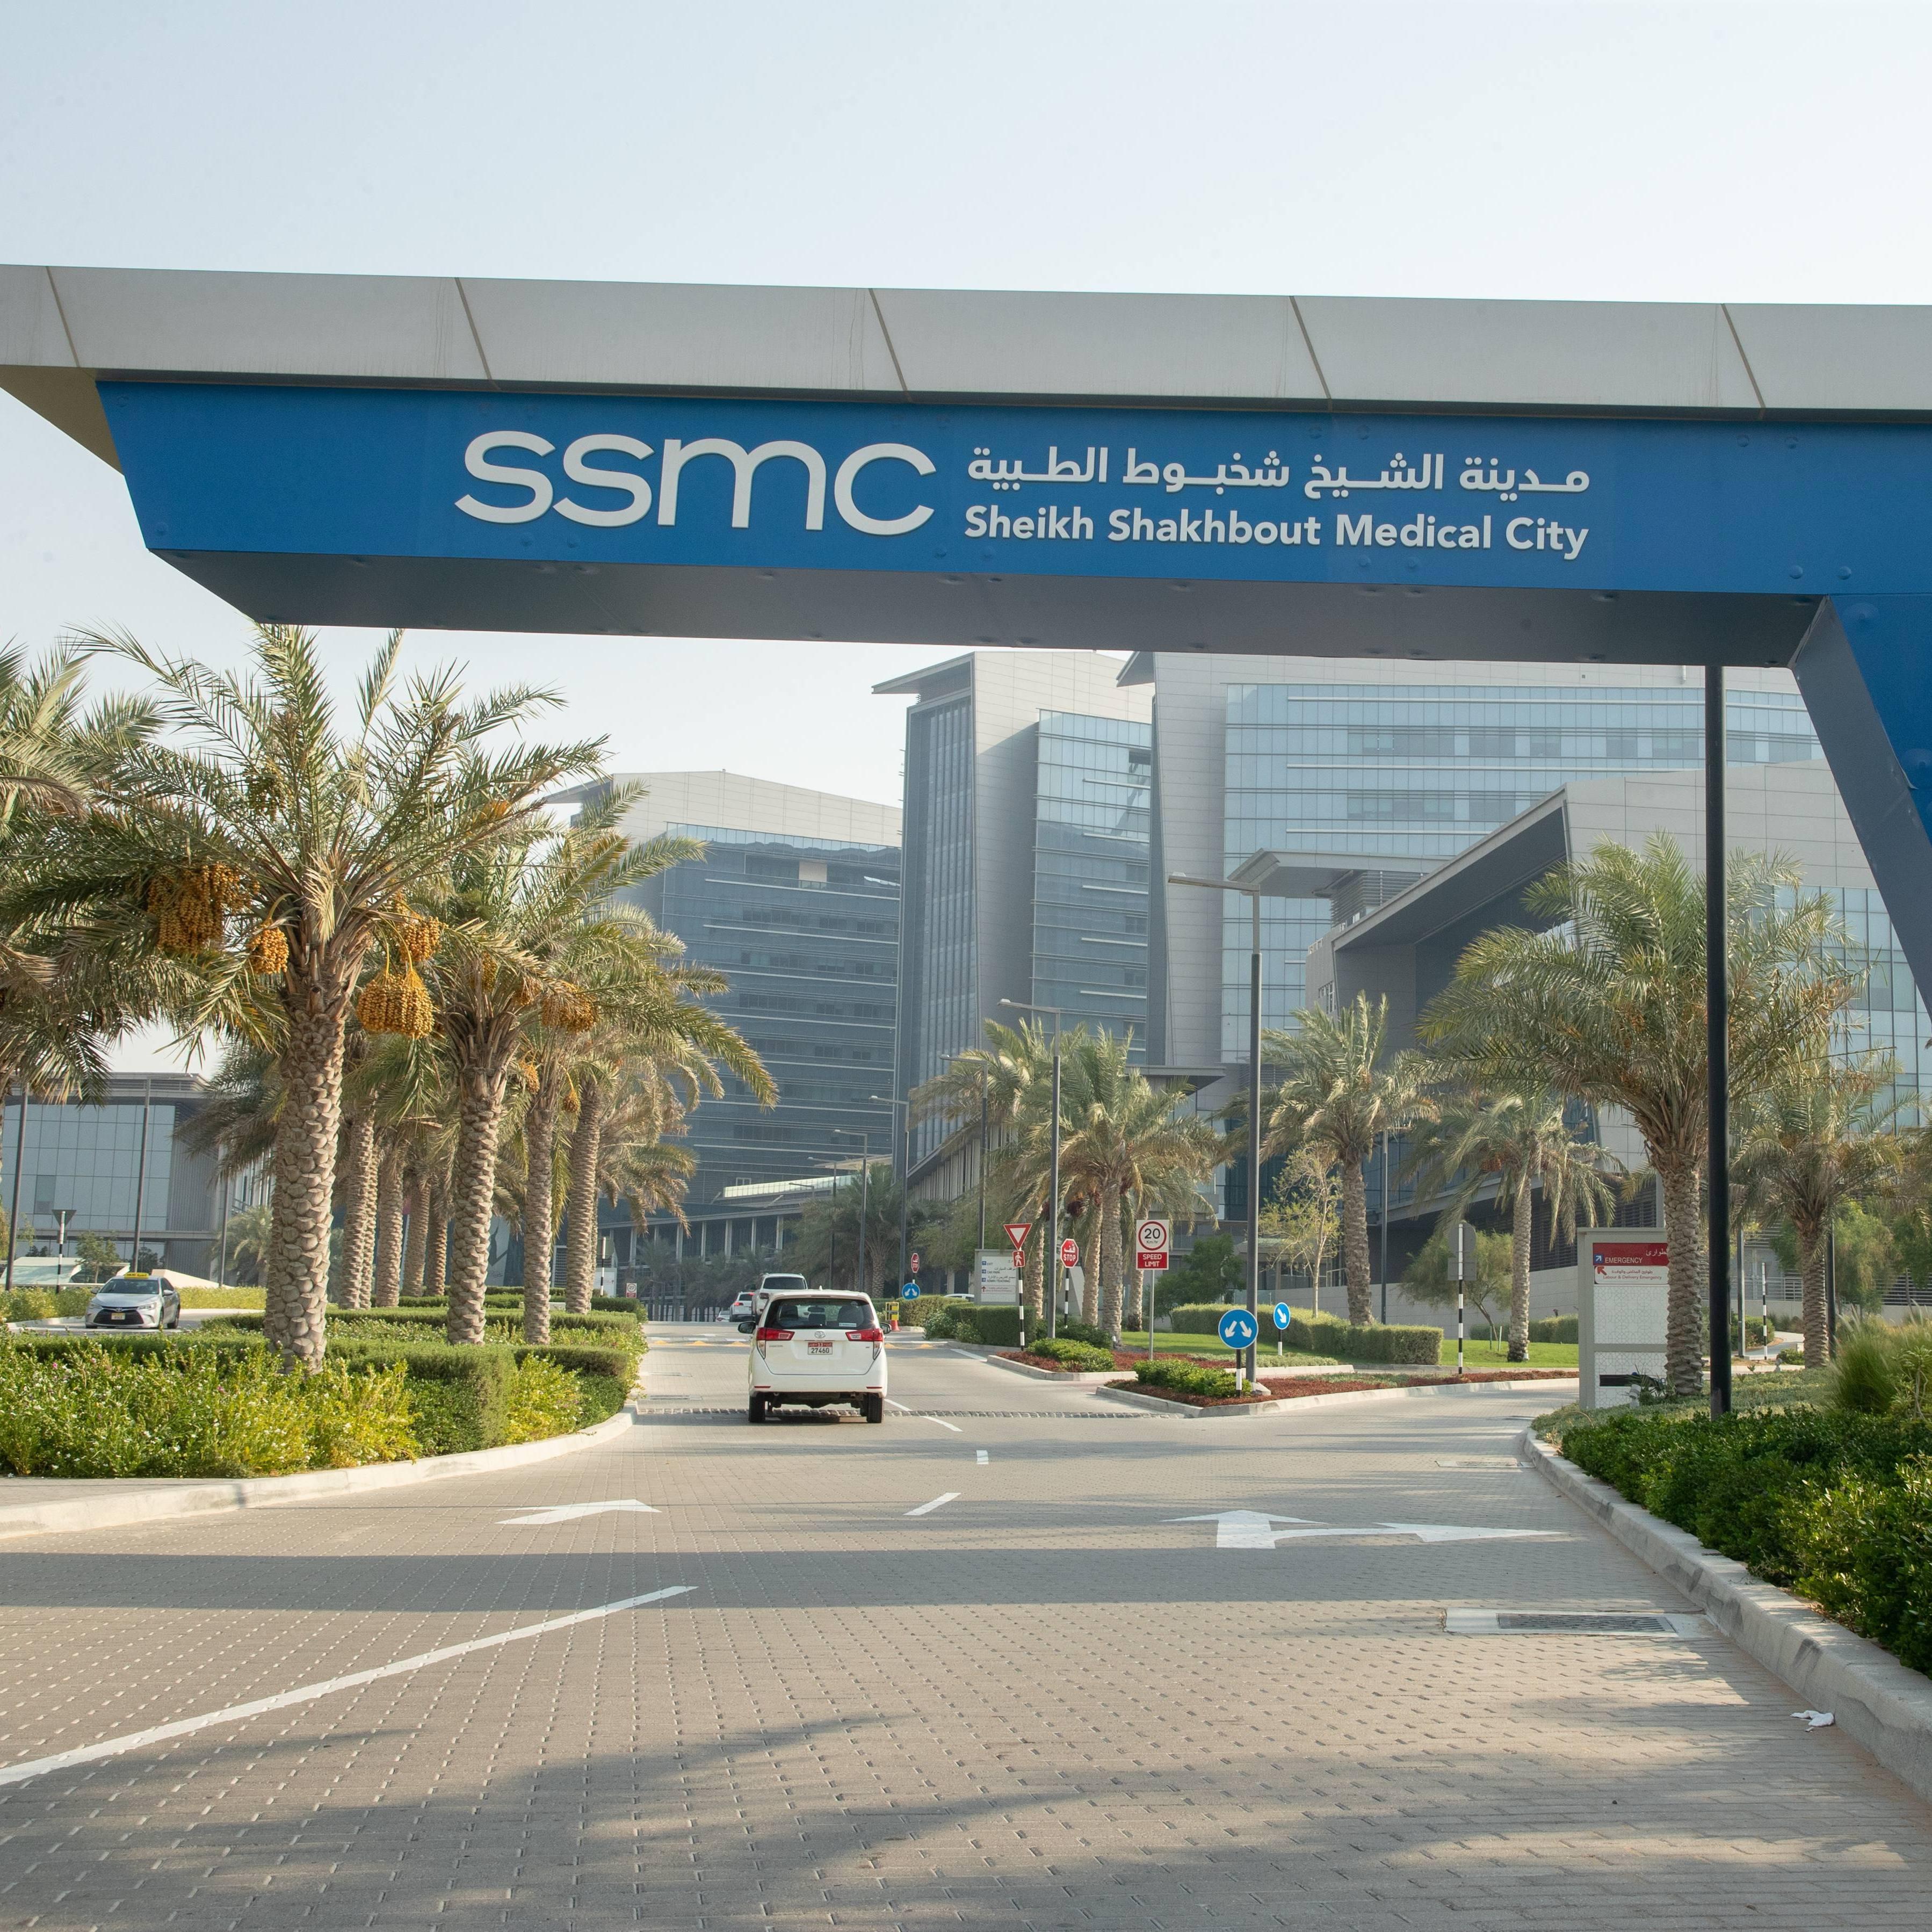 exterior image of entrance to Sheikh Shakhbout Medical City (SSMC)